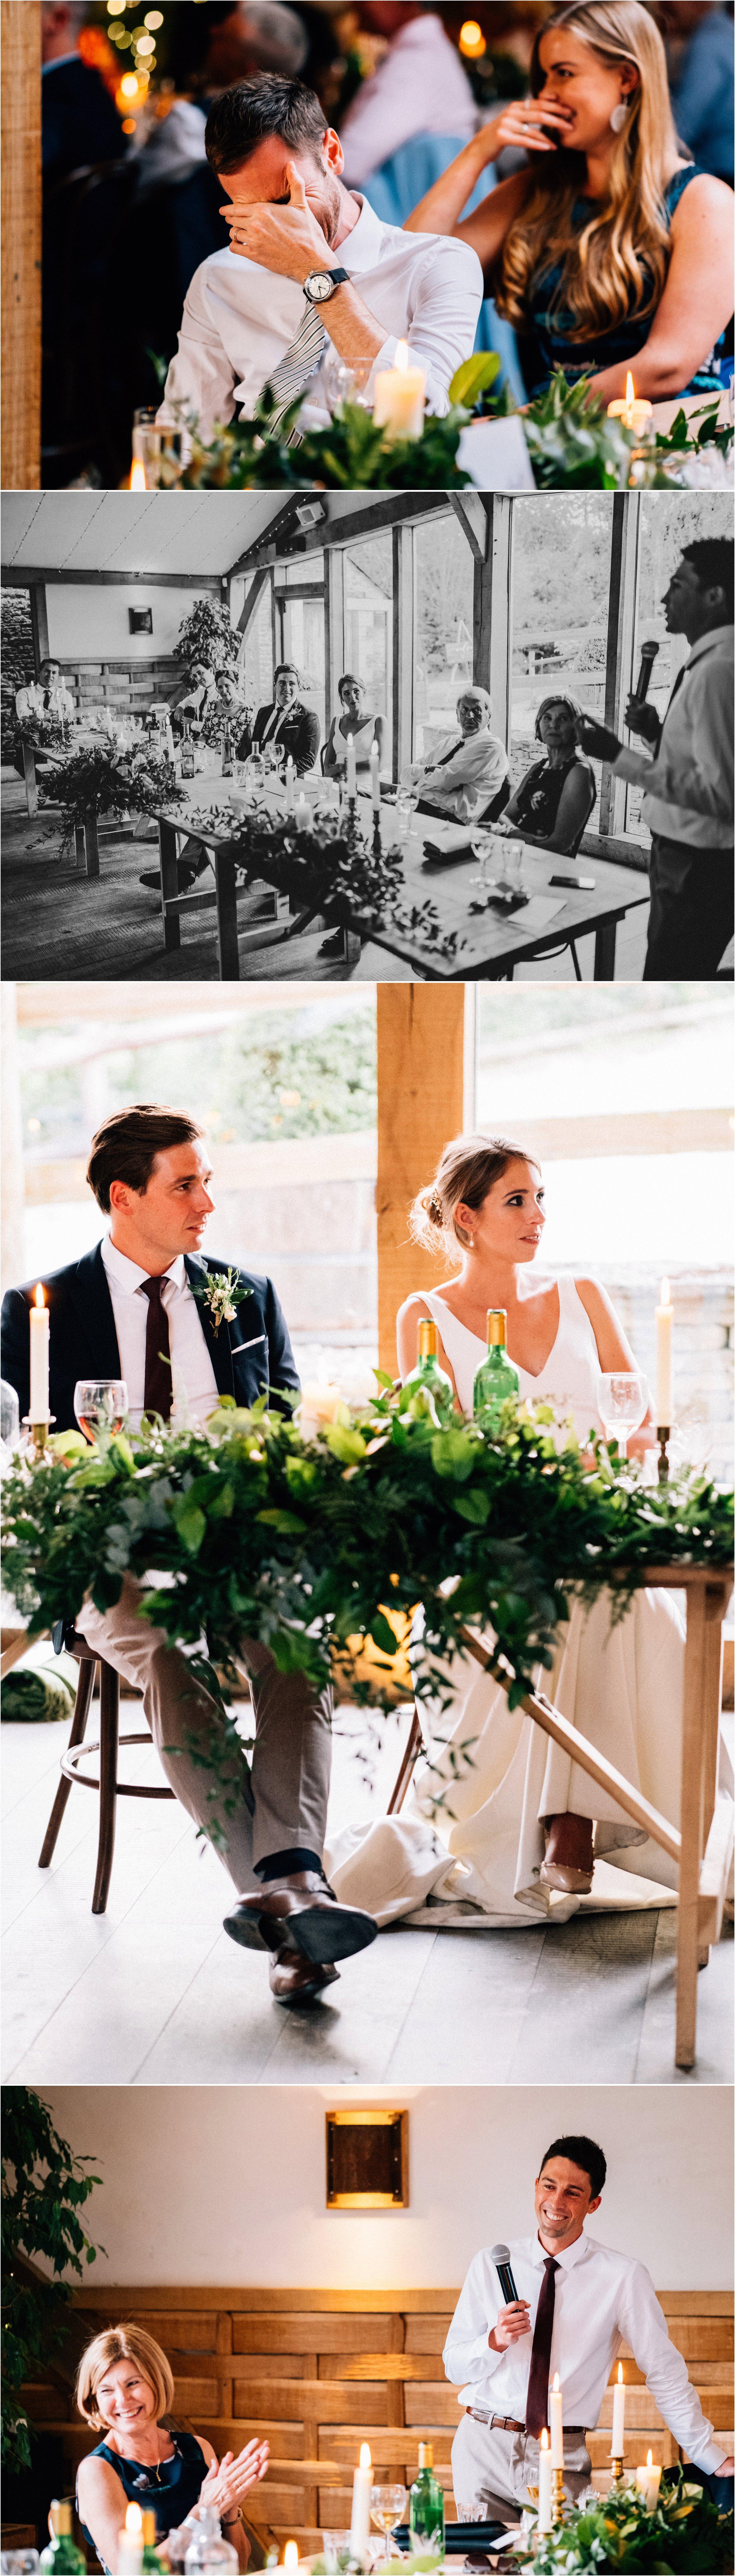 cripps barn wedding photographer_0108.jpg